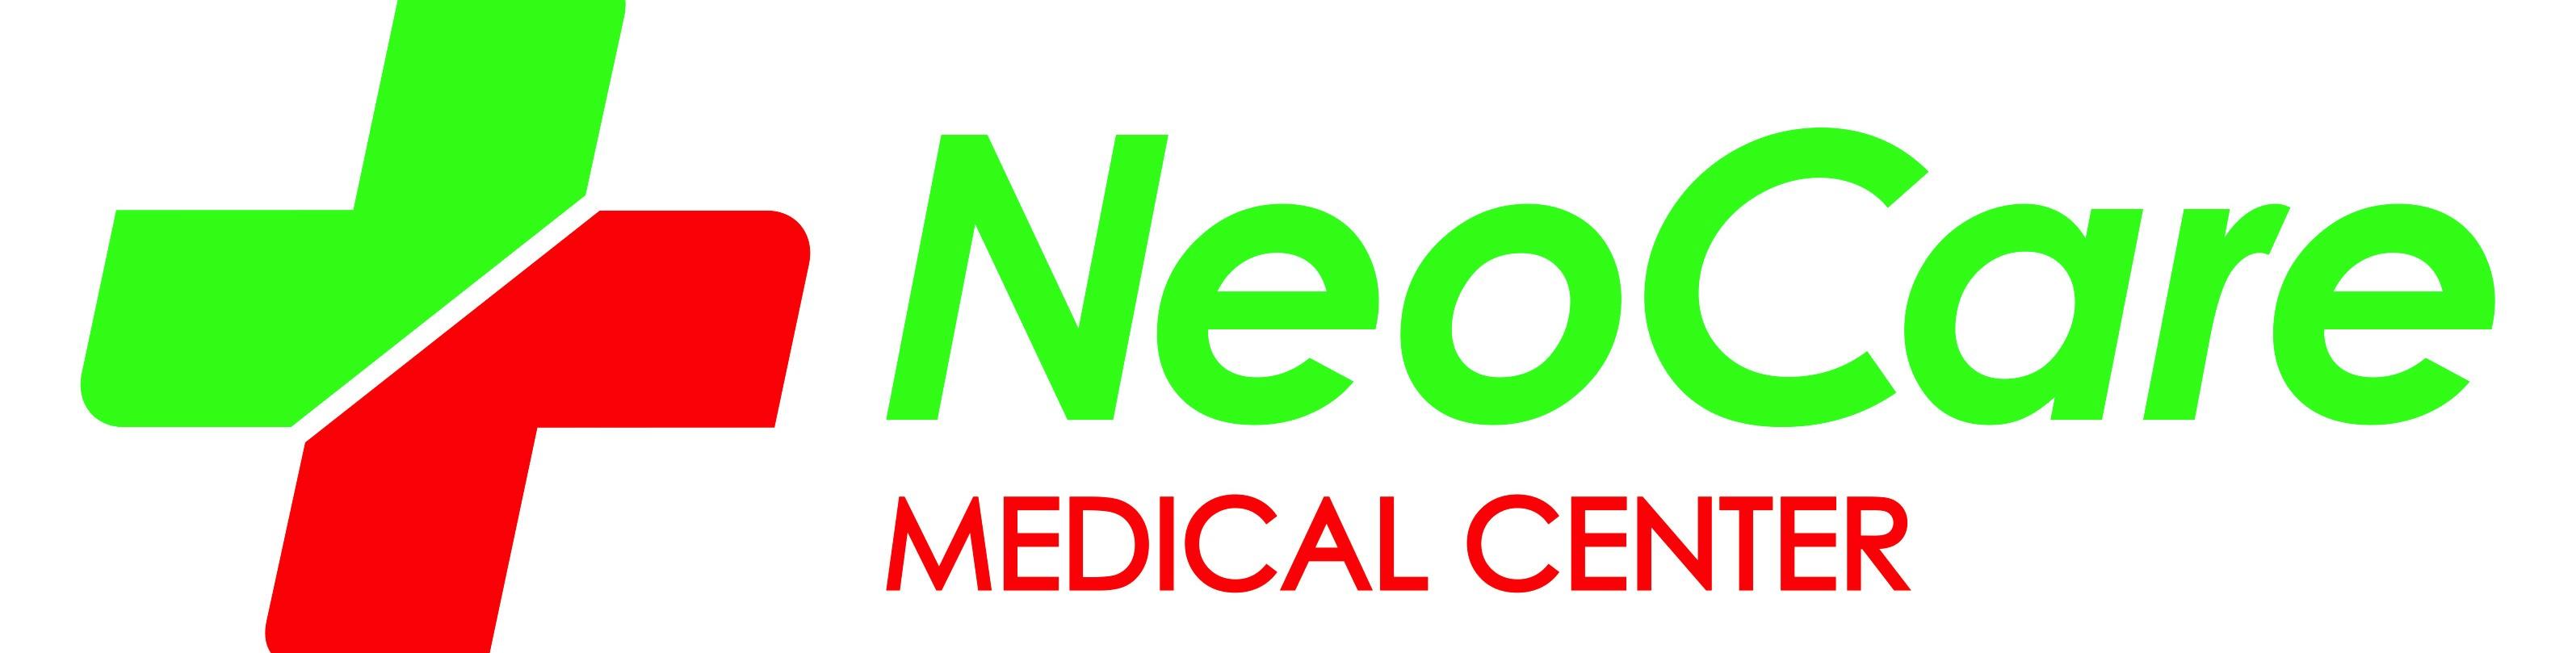 Neocare Medical Center